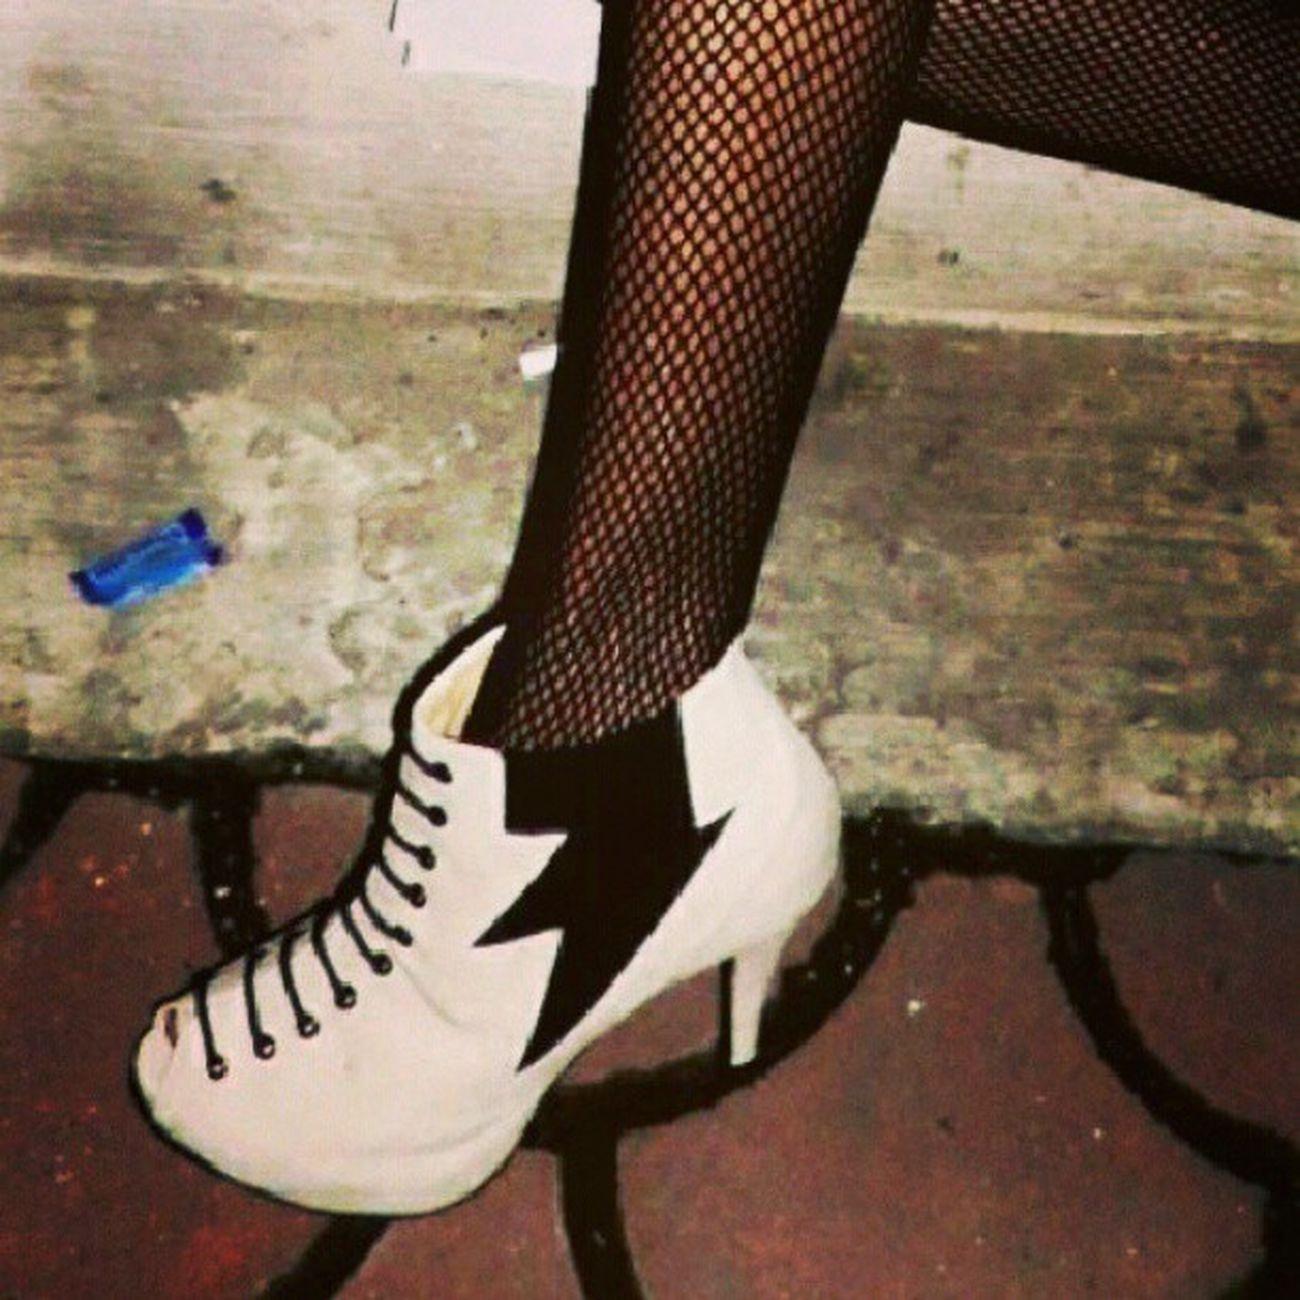 Thunder Shoes Koreanshoes Sexyshoes tumblr